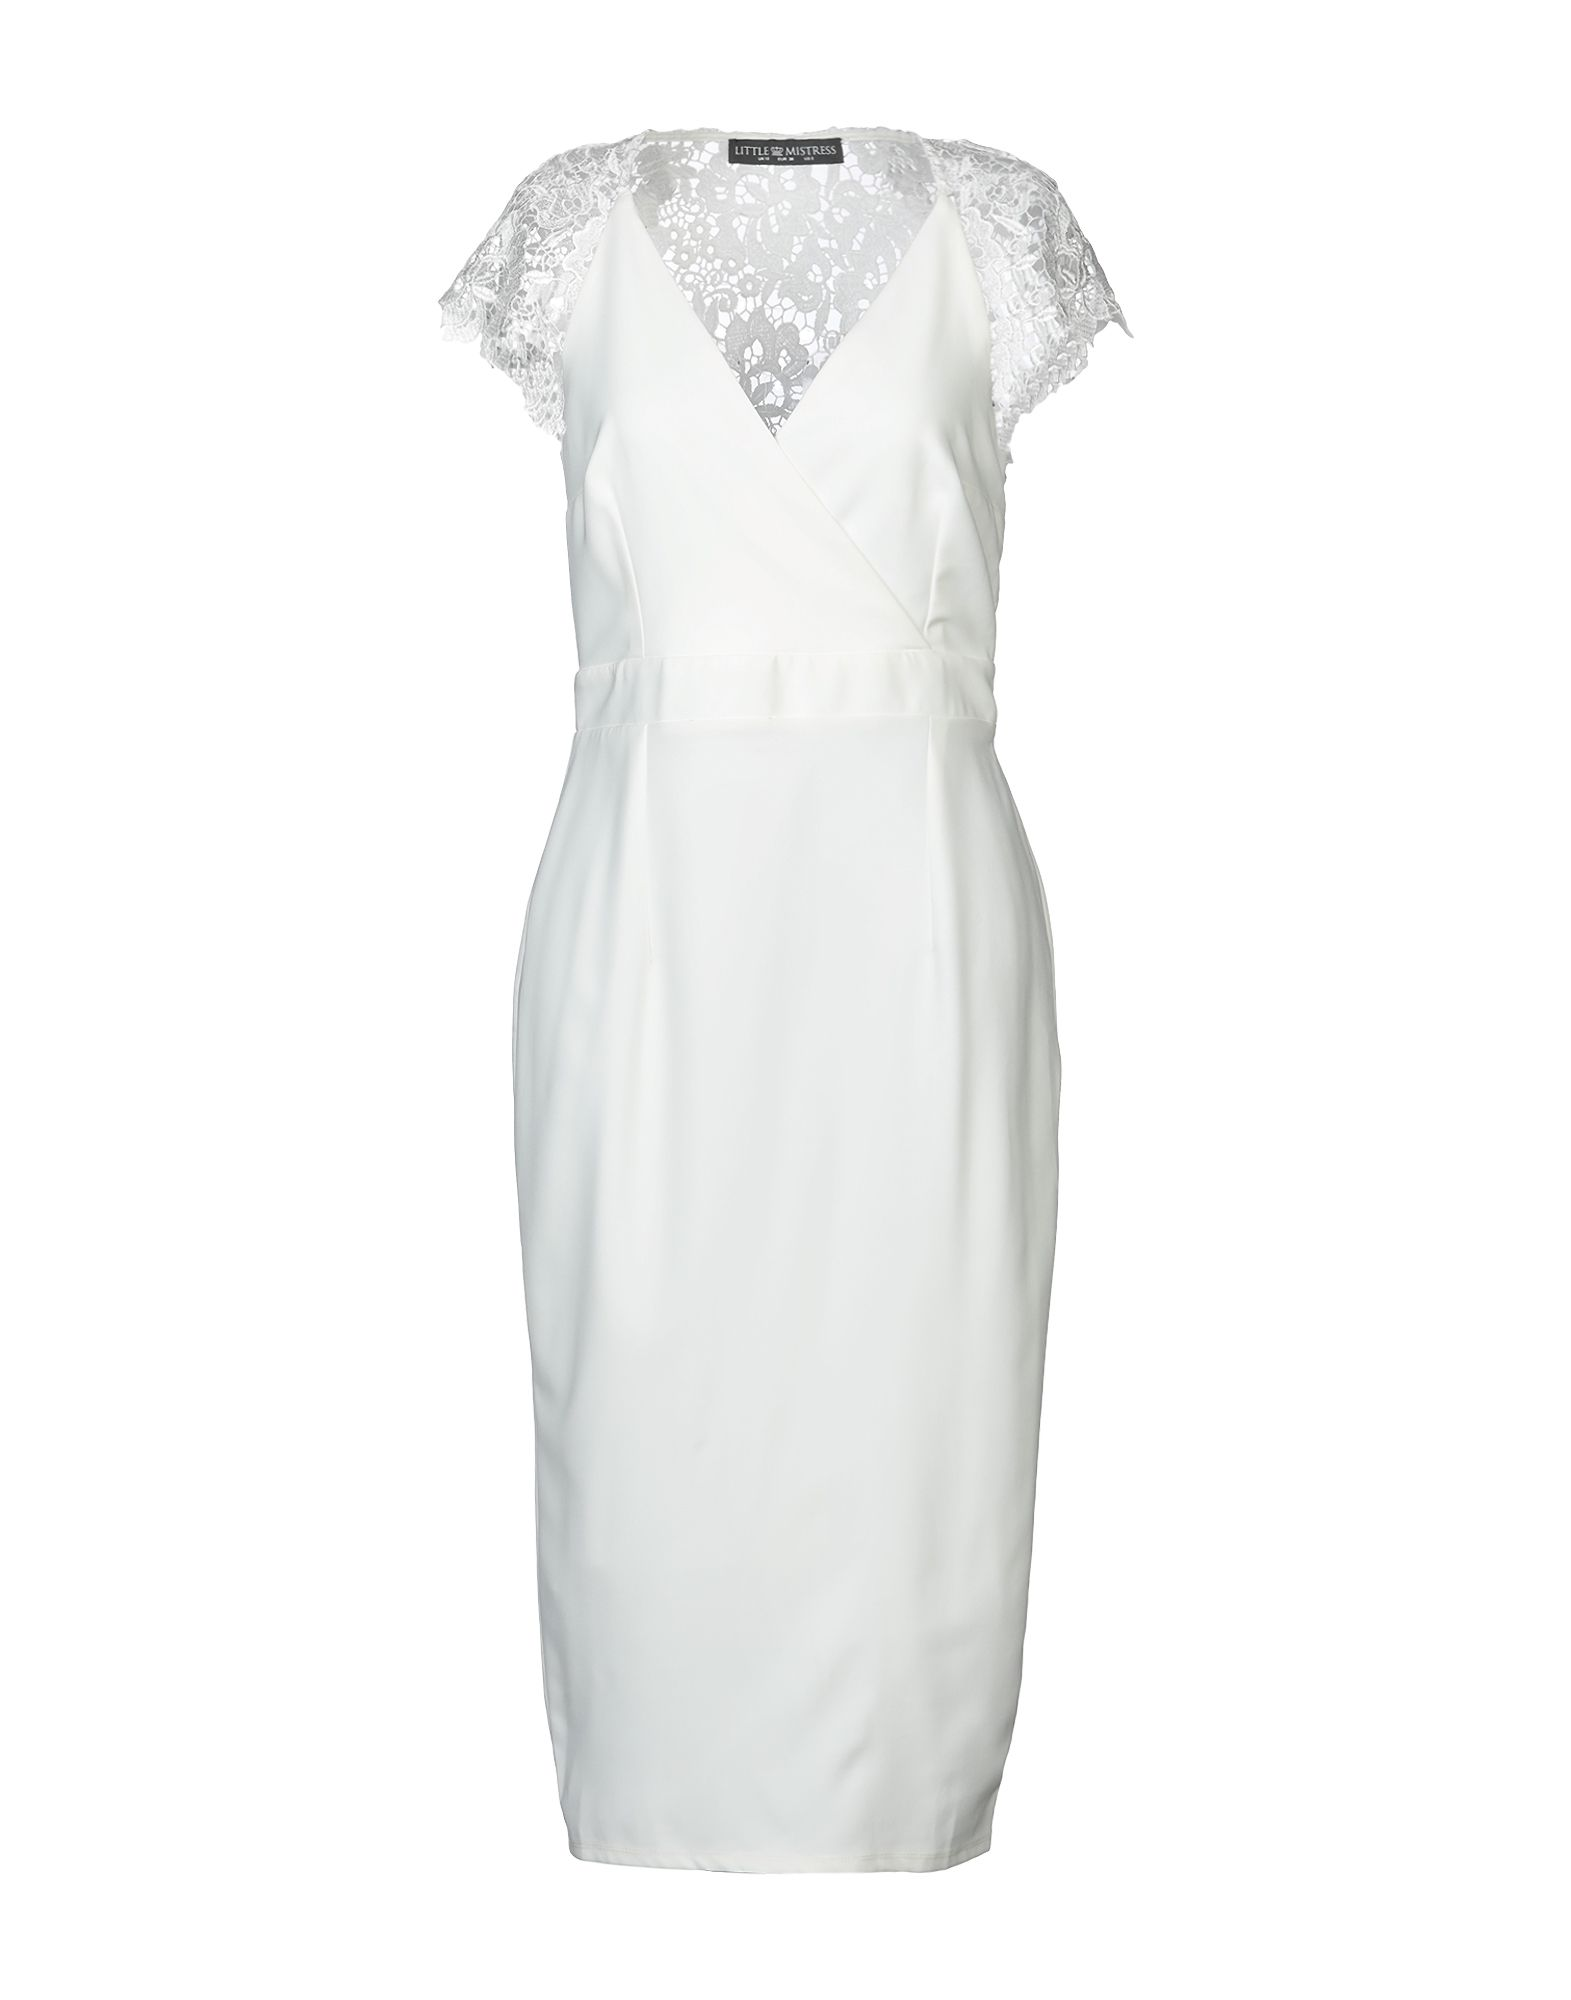 LITTLE MISTRESS London Платье длиной 3/4 little mistress london платье длиной 3 4